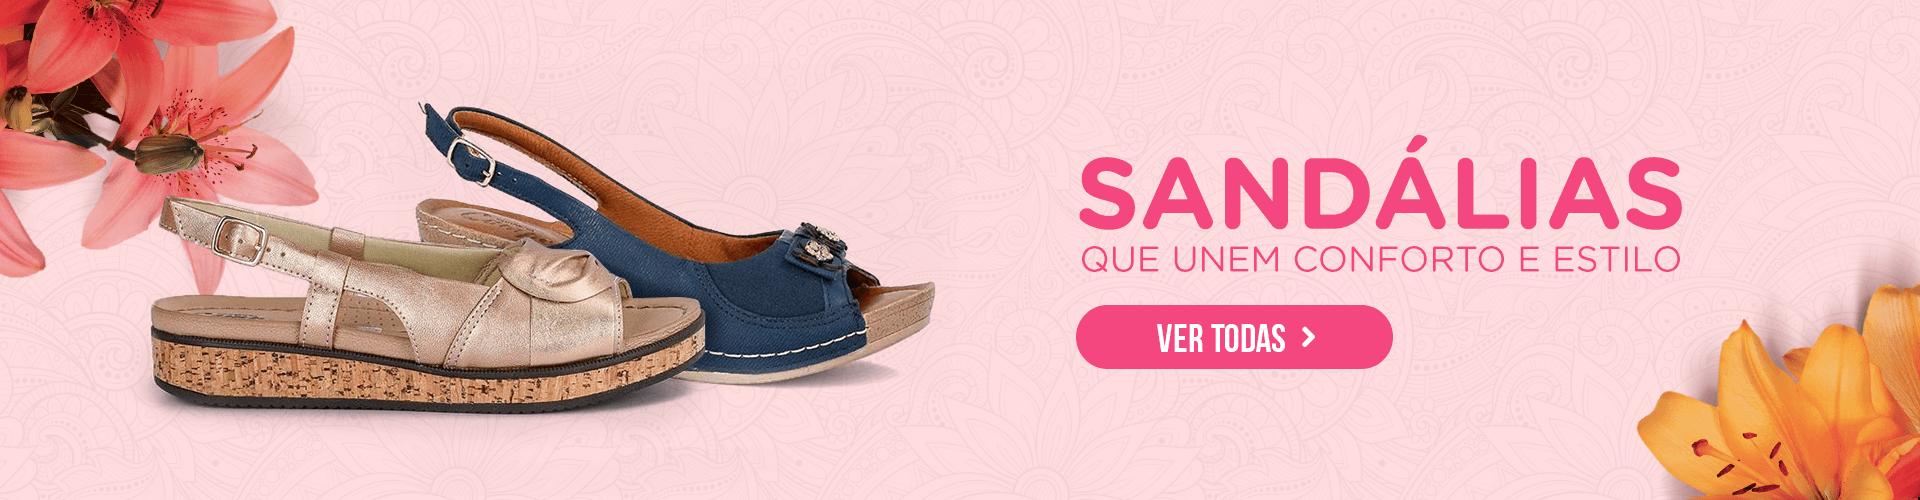 Sandálias que unem conforto e estilo